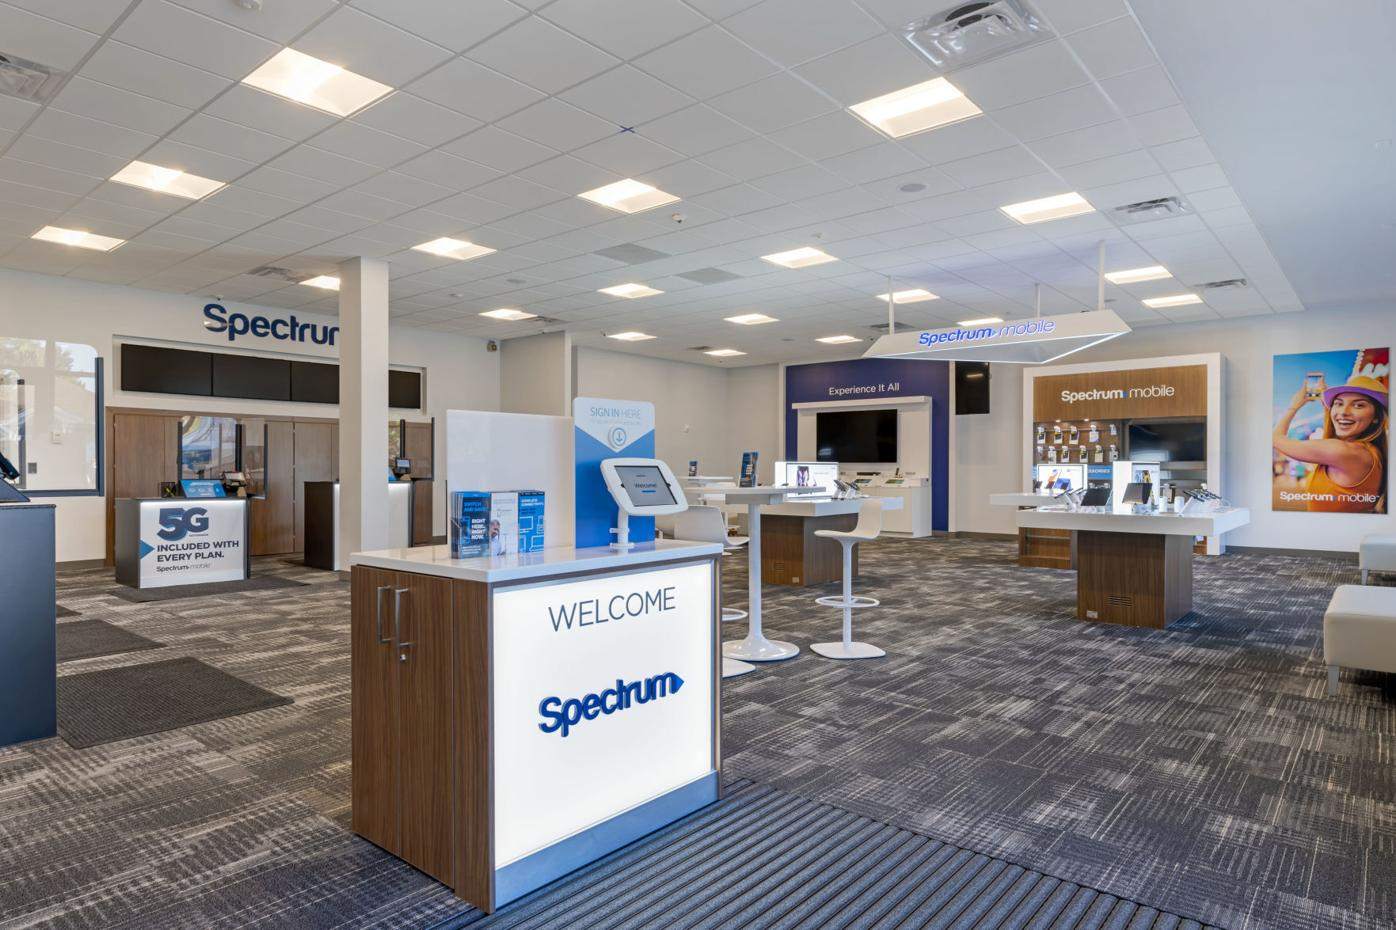 New Spectrum store